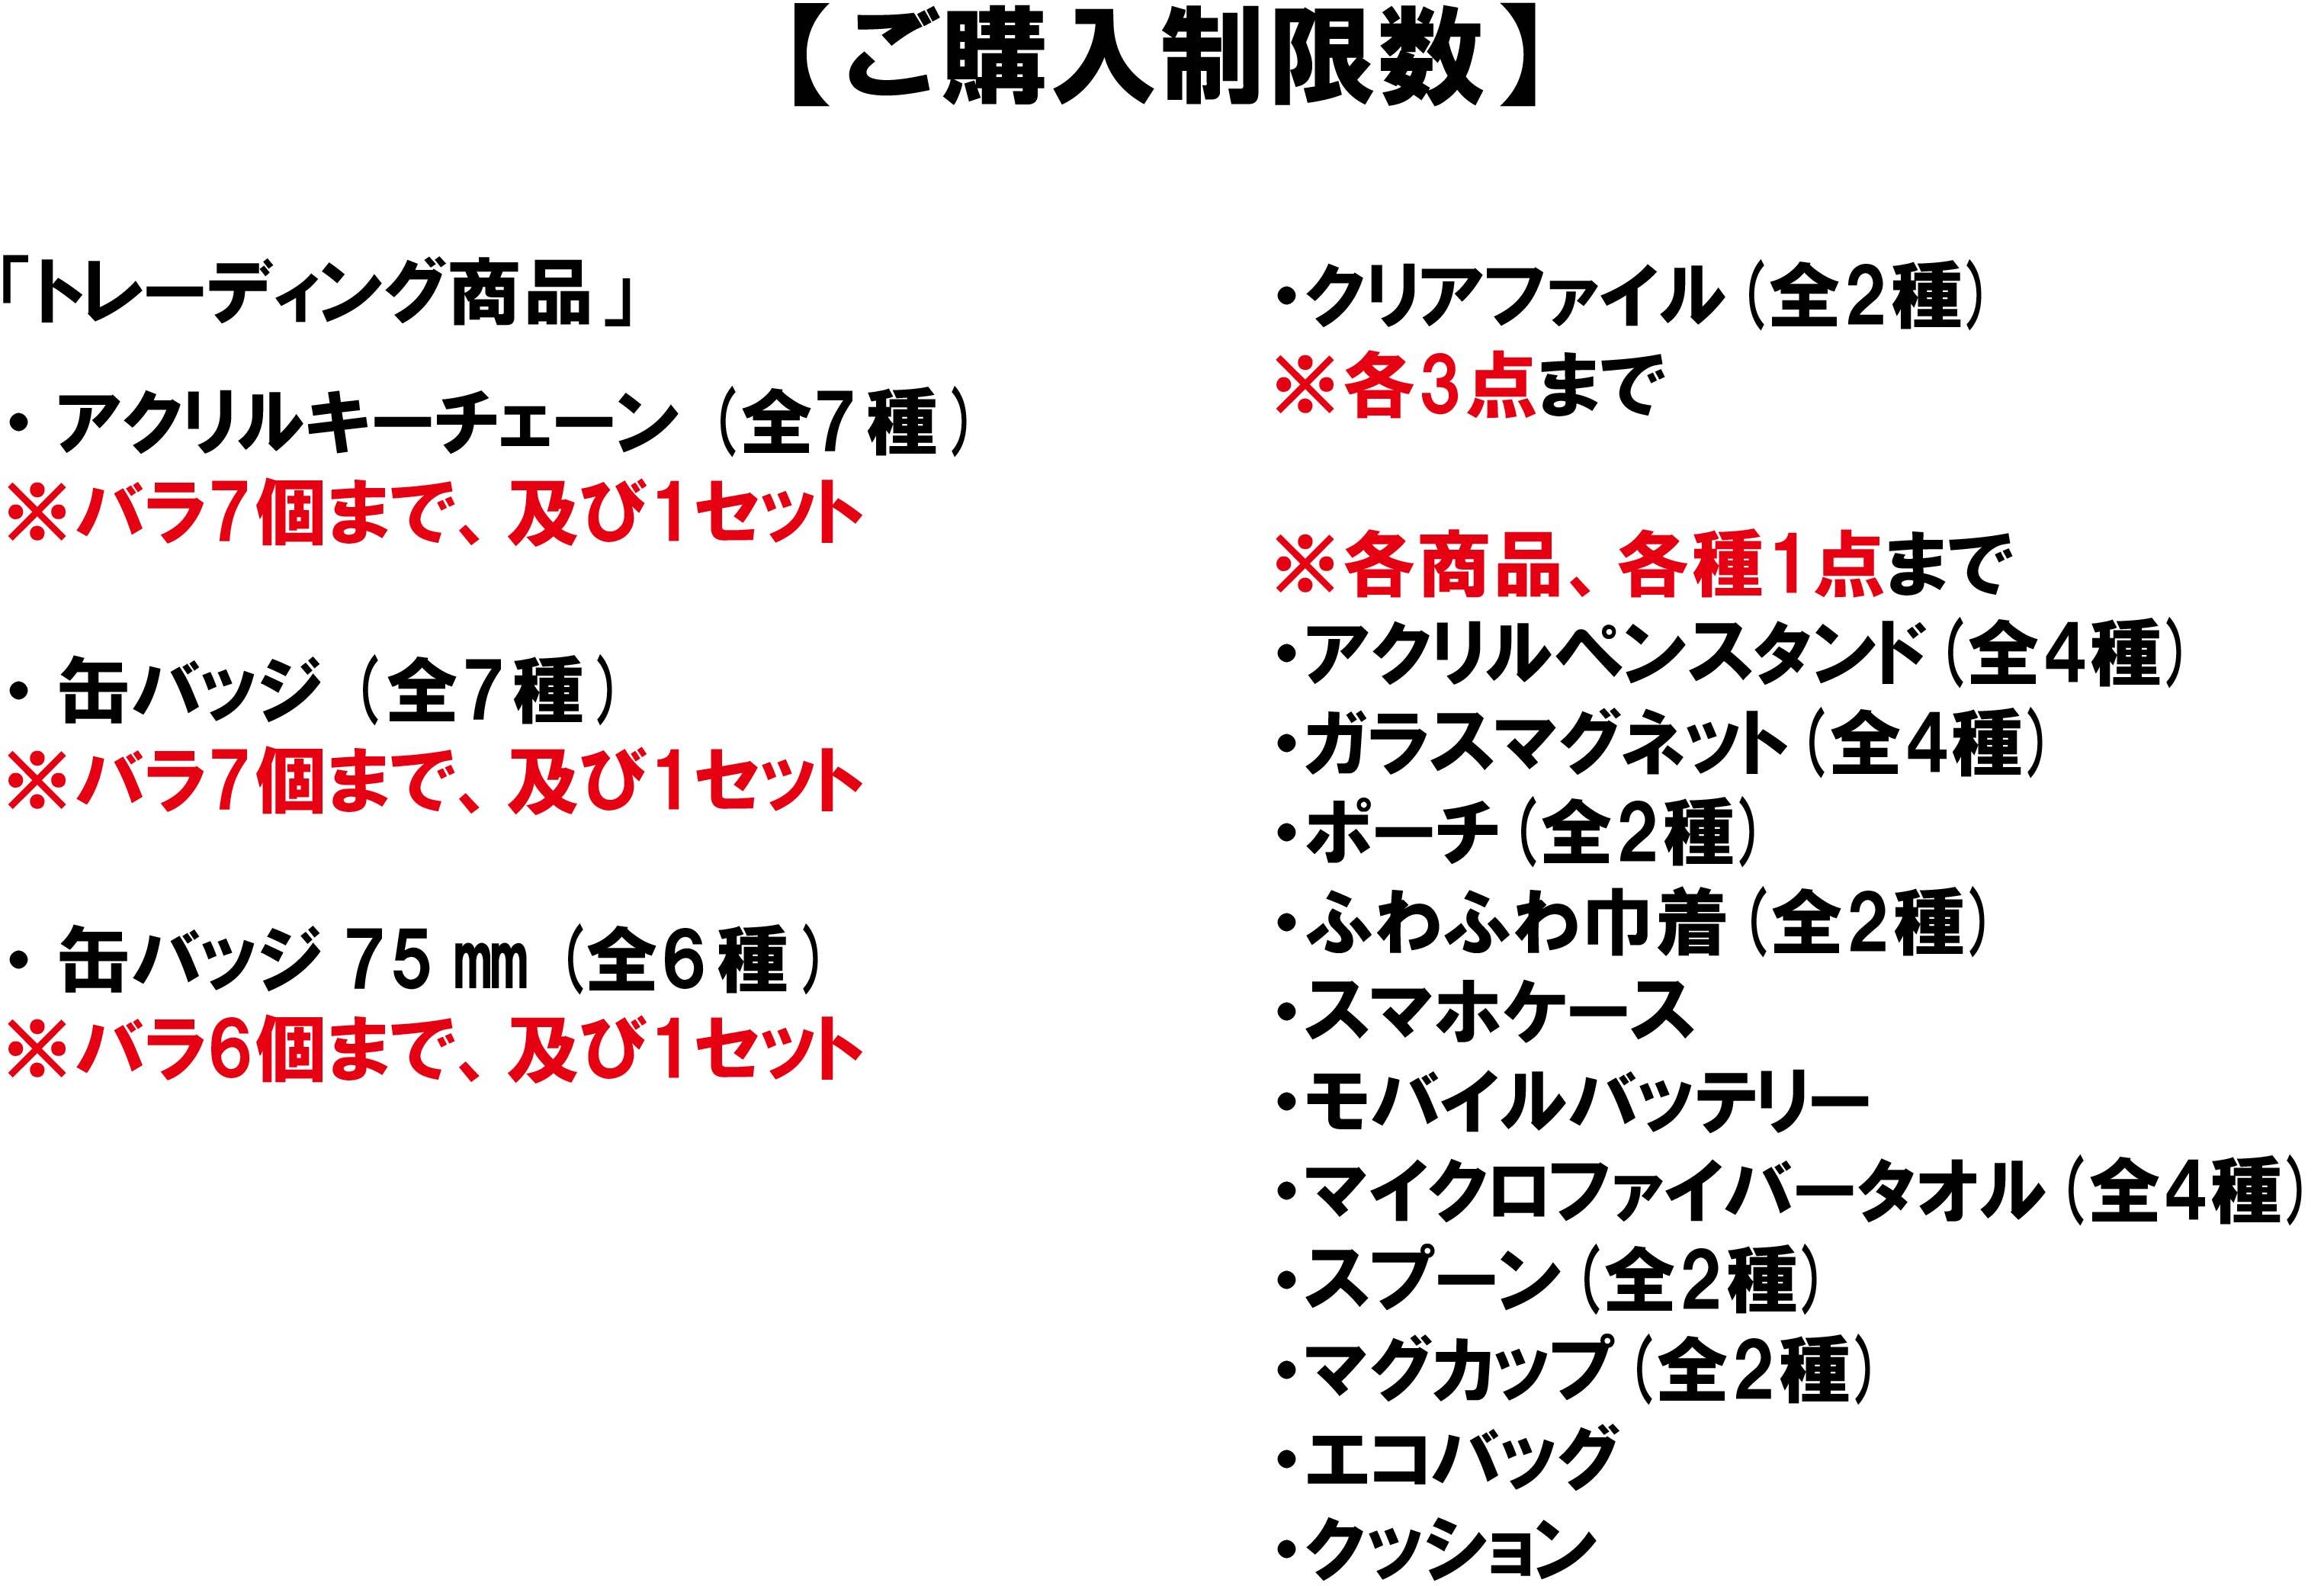 singekiメニュー.jpg